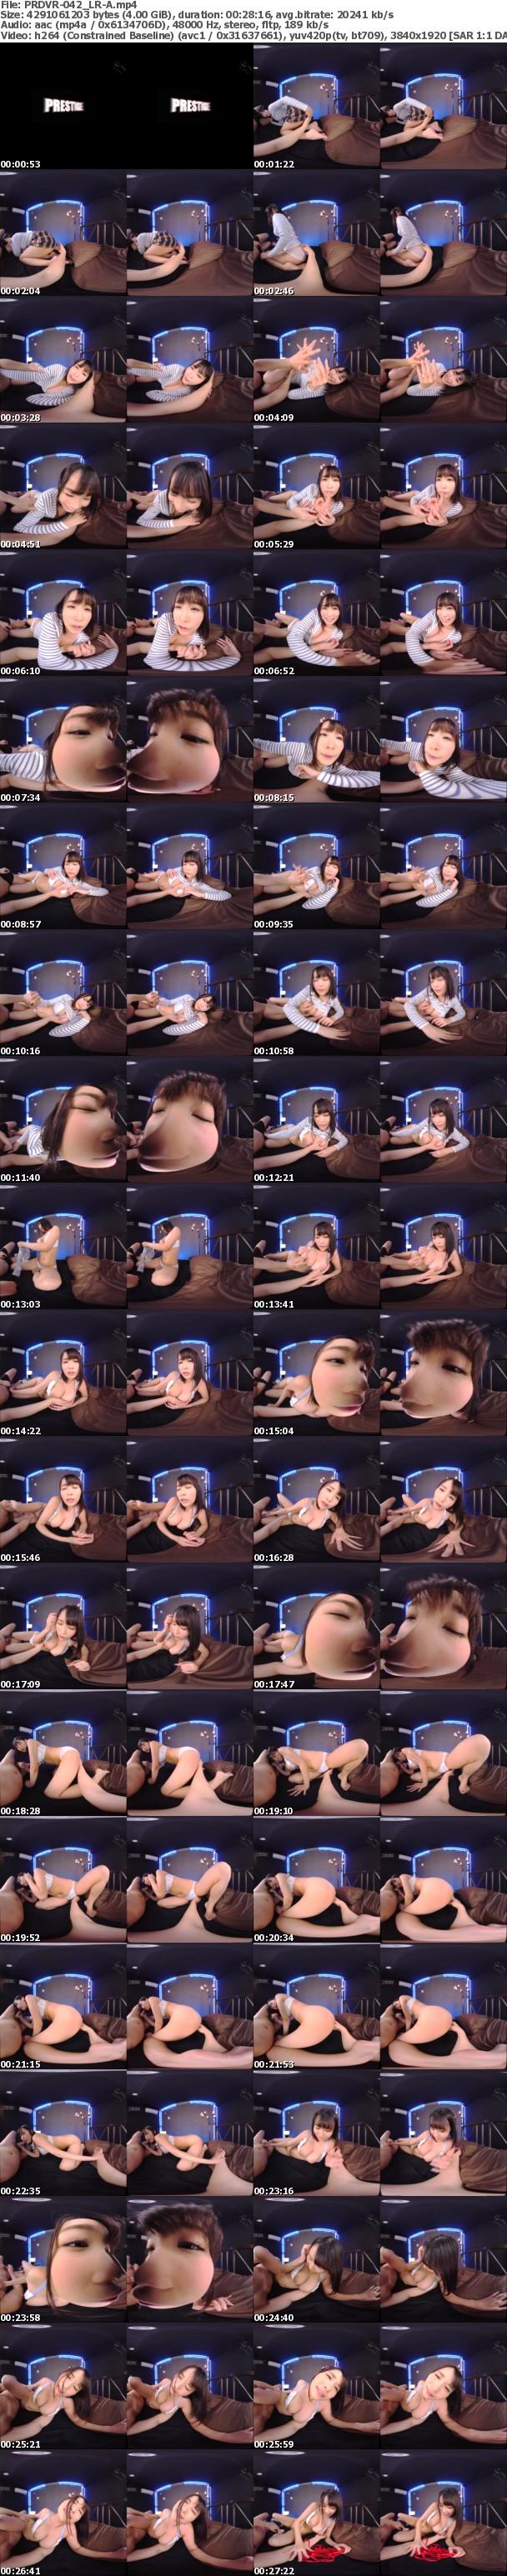 (VR) PRDVR-042 【4K匠】激イキ 爆揺れHカップ!ドMな恋人・河合あすなをイカせまくる濃密ハードセックス!